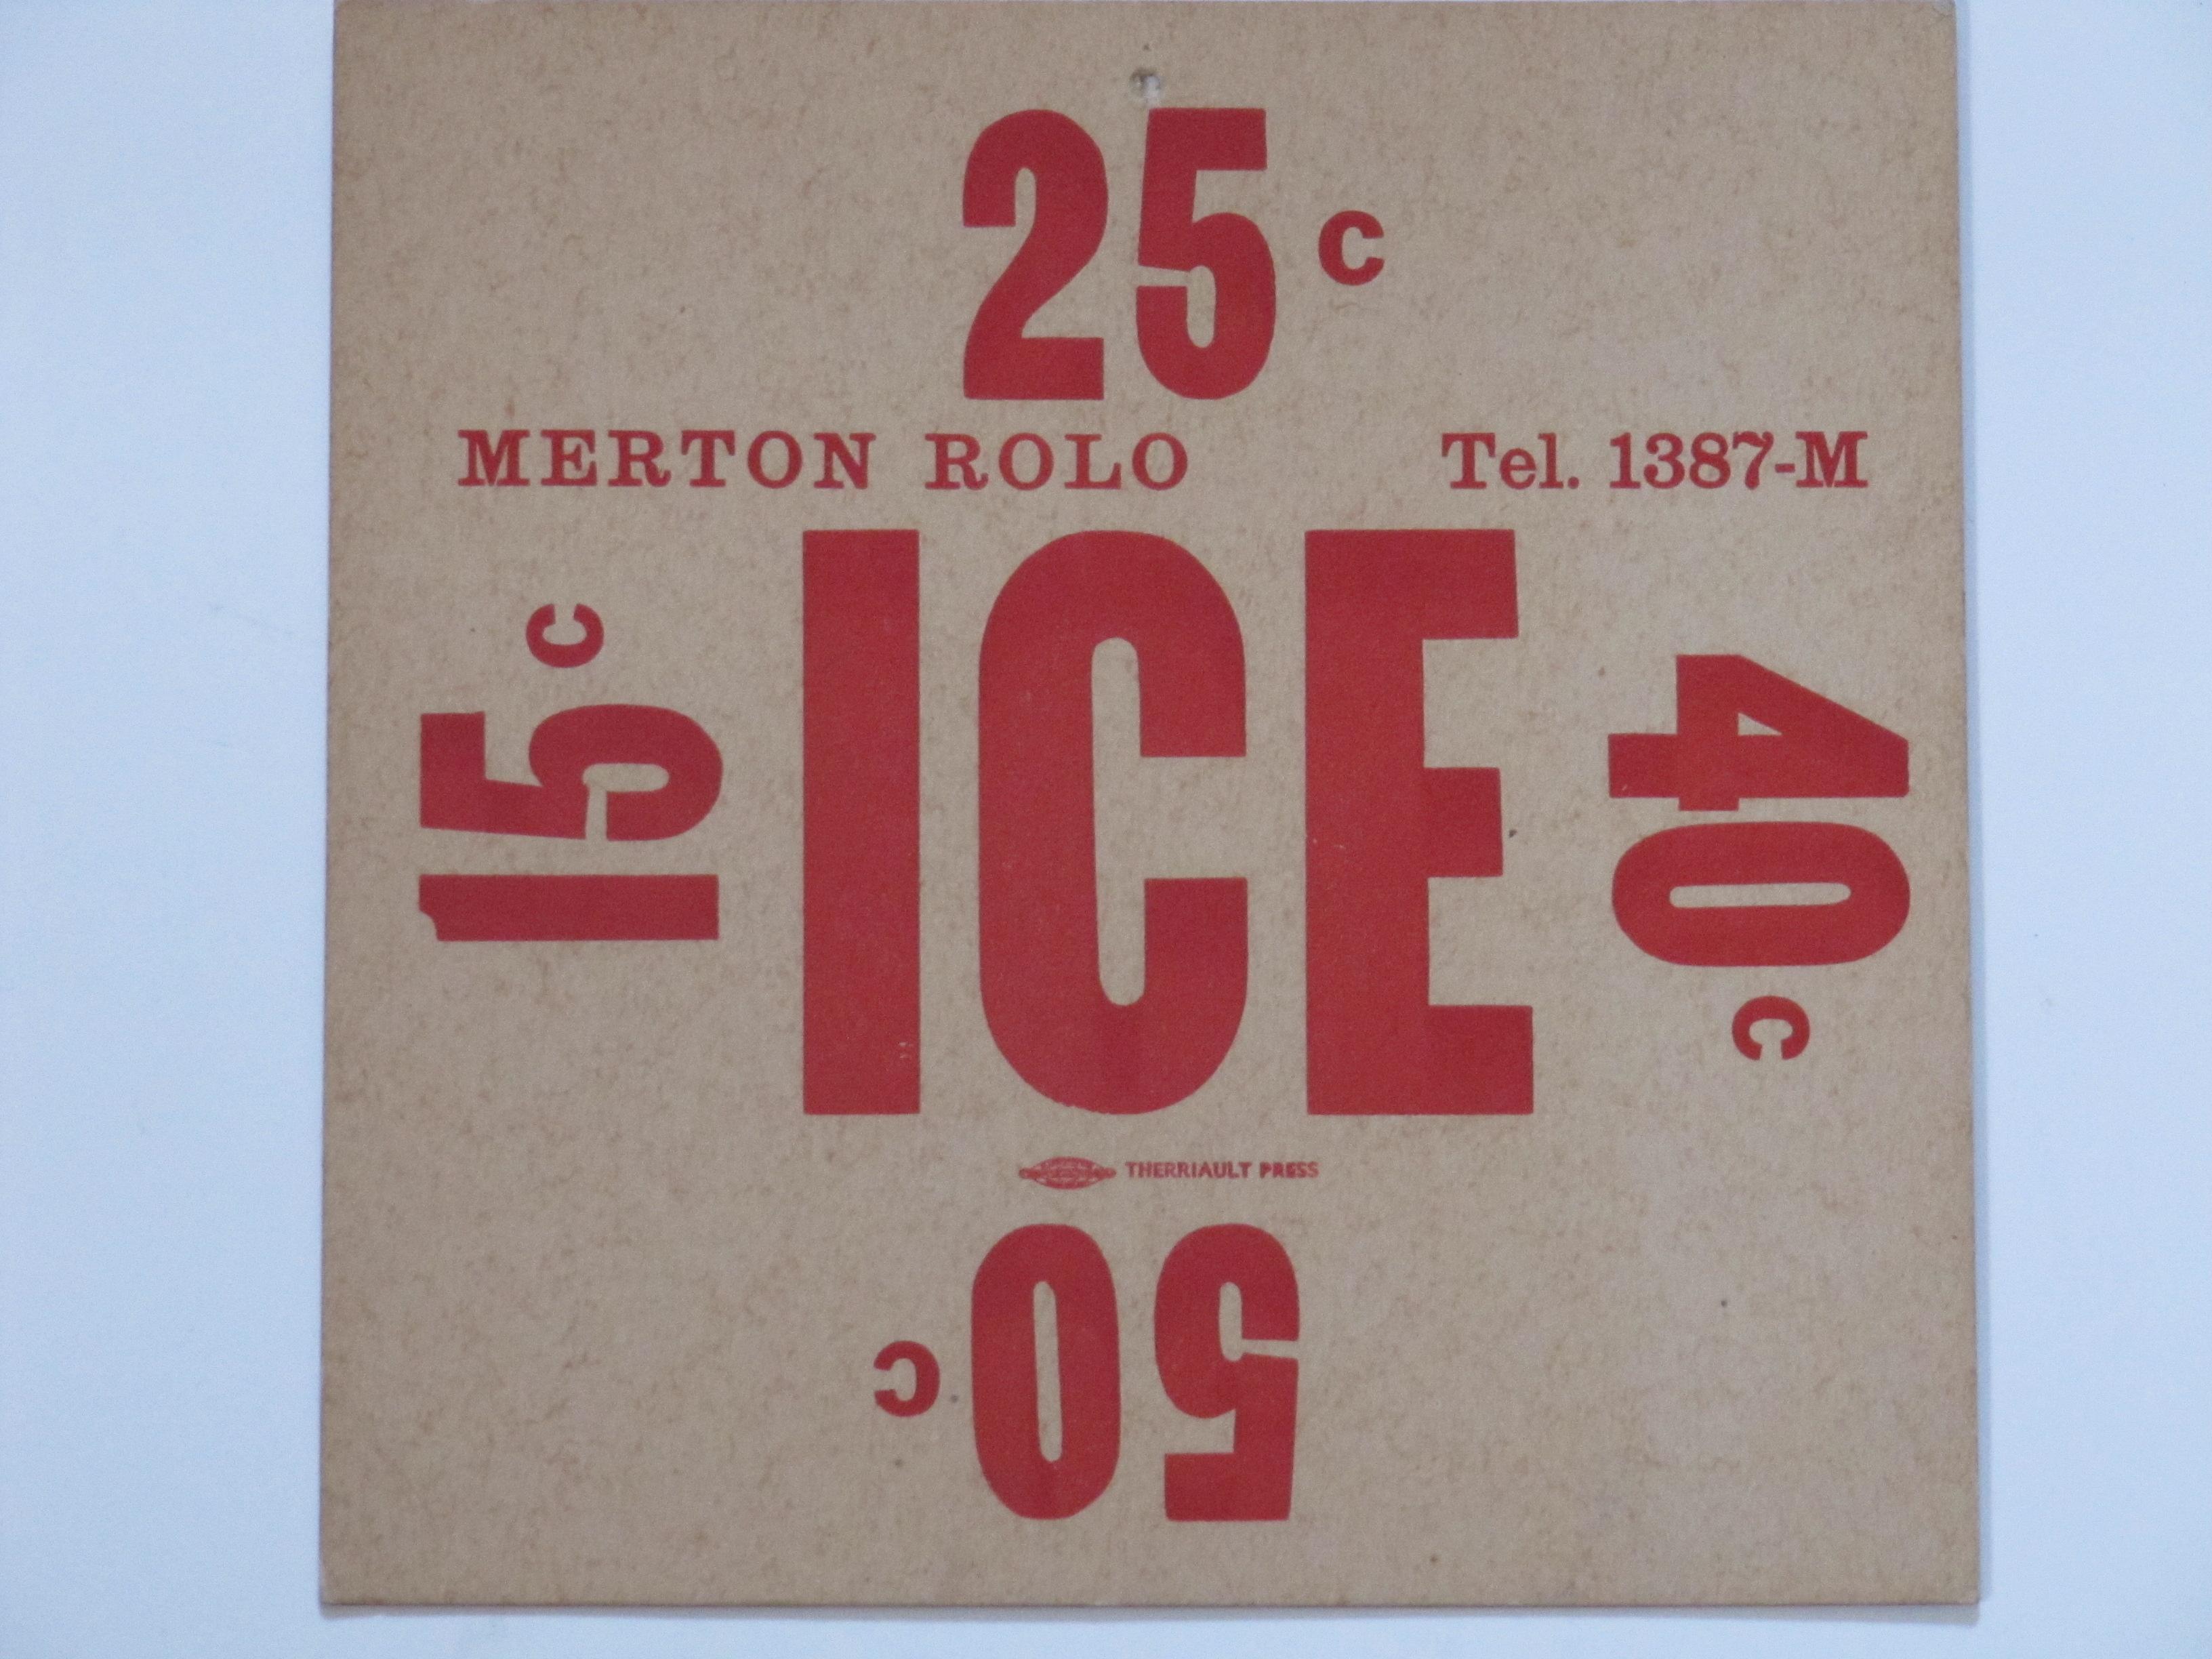 Merton Rolo Ice